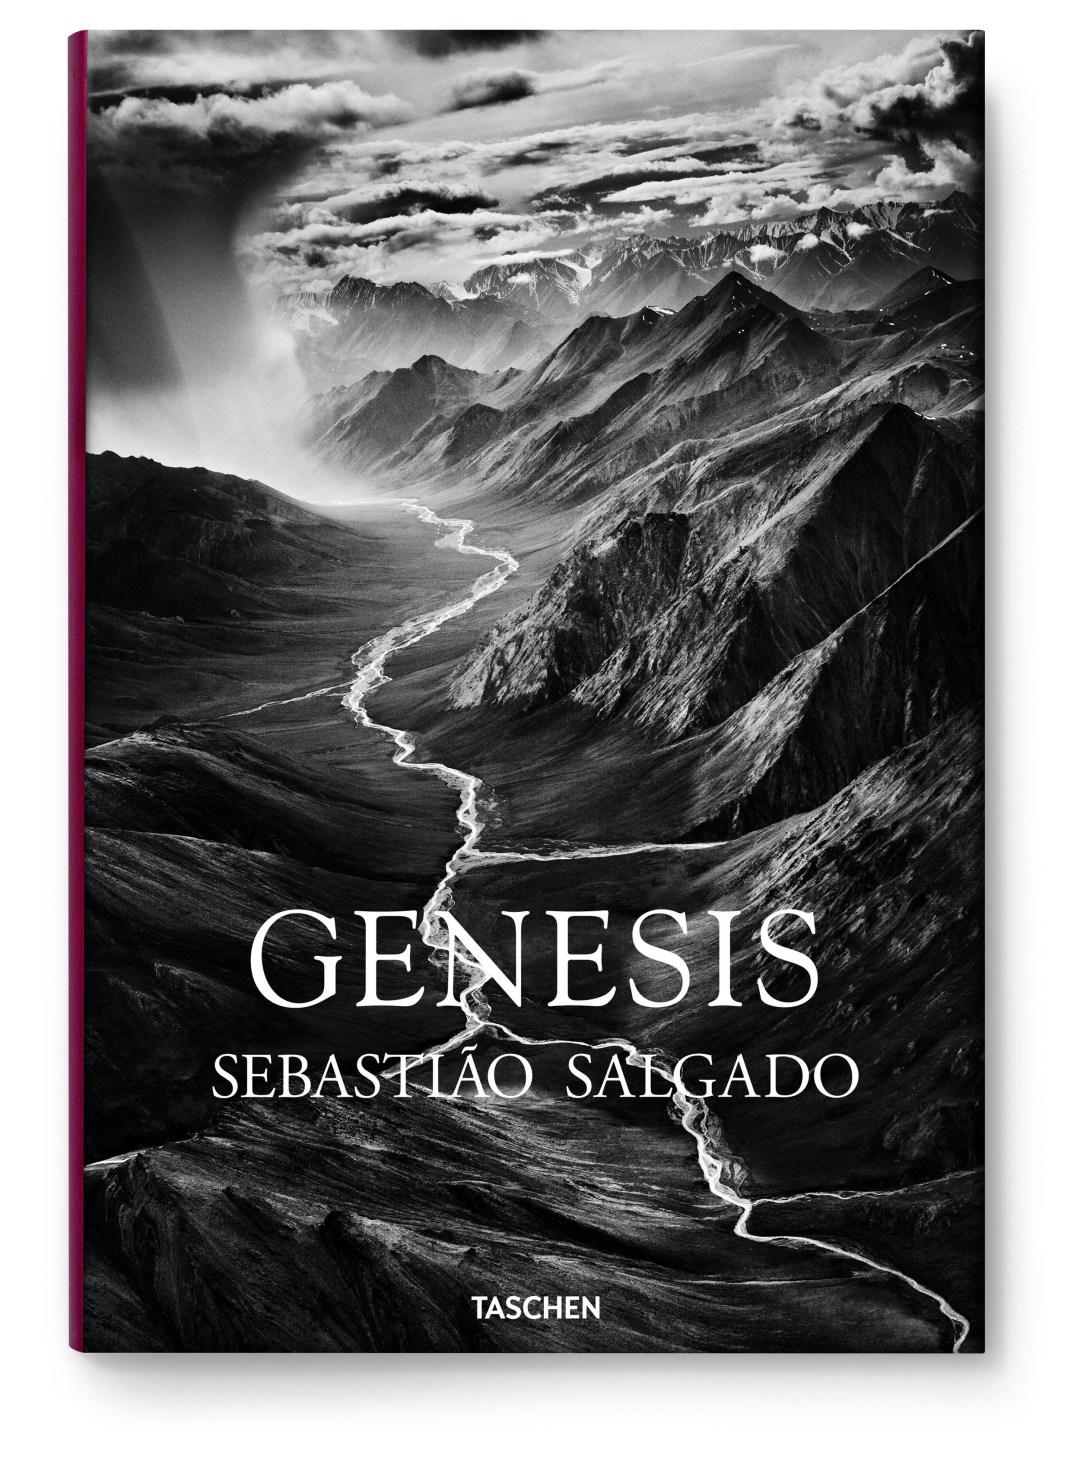 Sebastiao Salgado. The Genesis Story